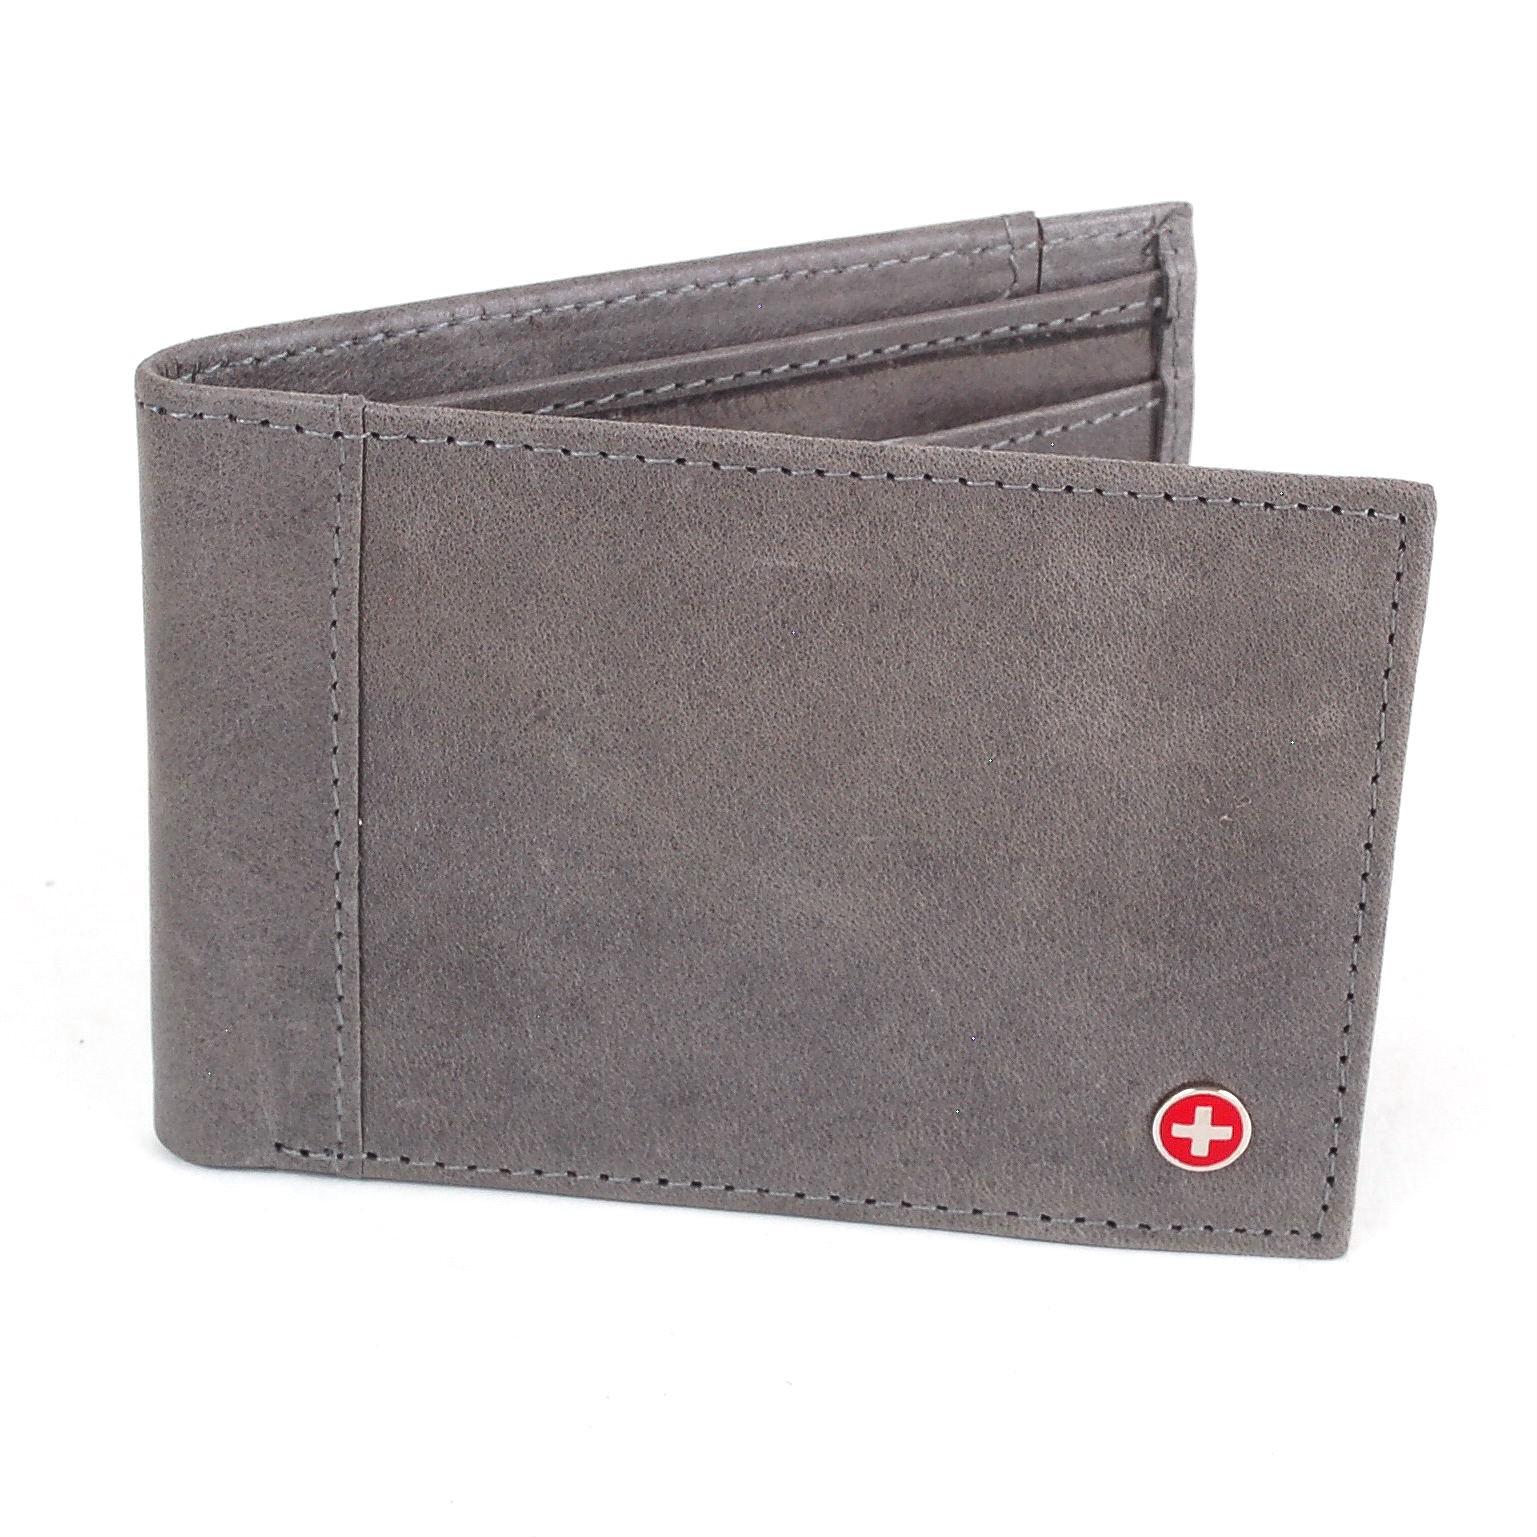 Alpine-Swiss-Mens-Thin-Bifold-Wallet-Top-Grain-Leather-EZ-Access-Outer-Card-Slot thumbnail 64